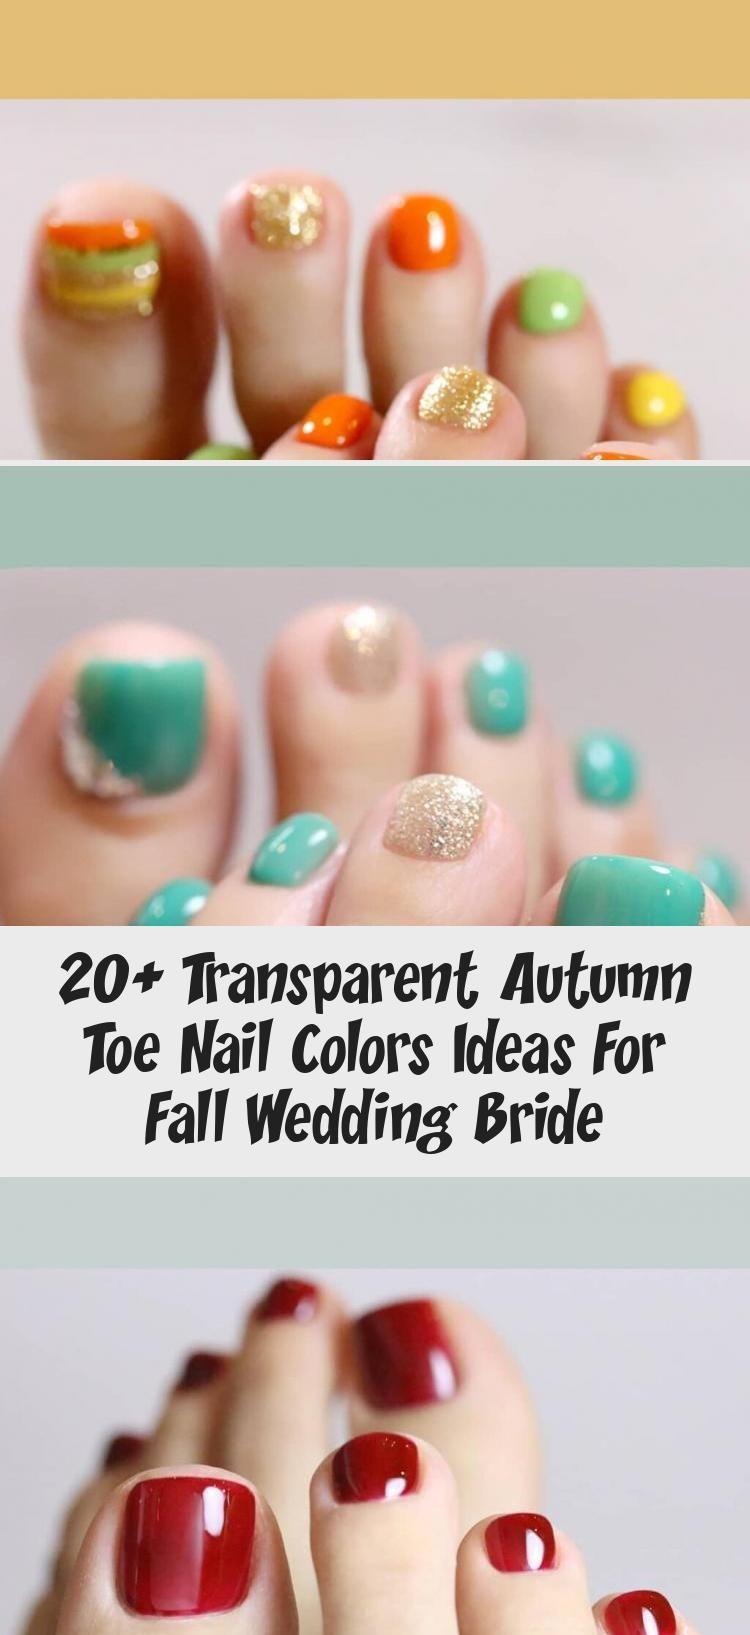 Photo of 20+ Transparent Autumn Toe Nail Colors Ideas For Fall Wedding Bride – Nail Art